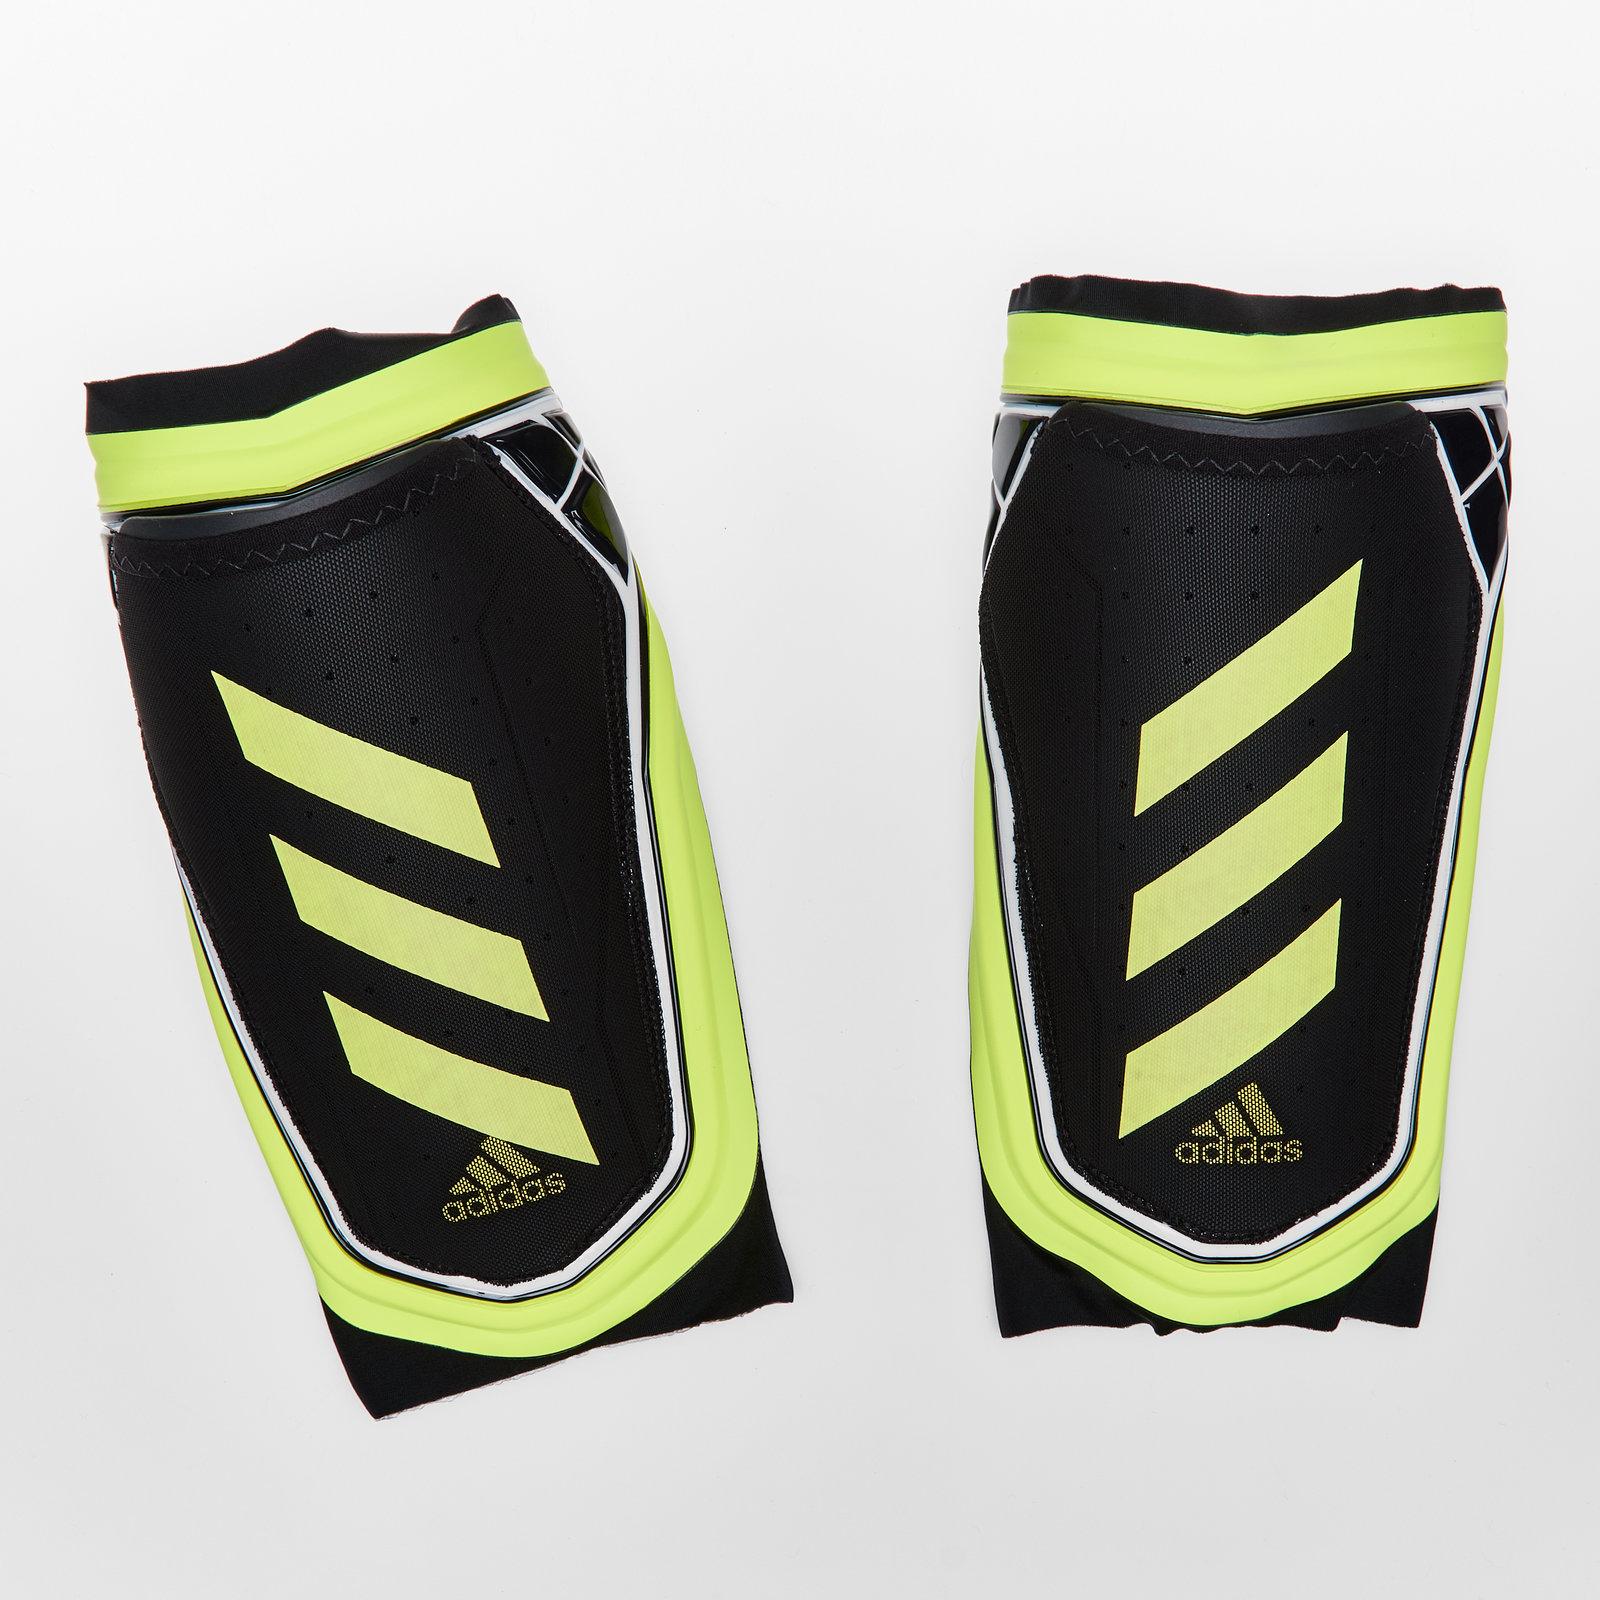 adidas Mens X Foil Sleeve Football Shin